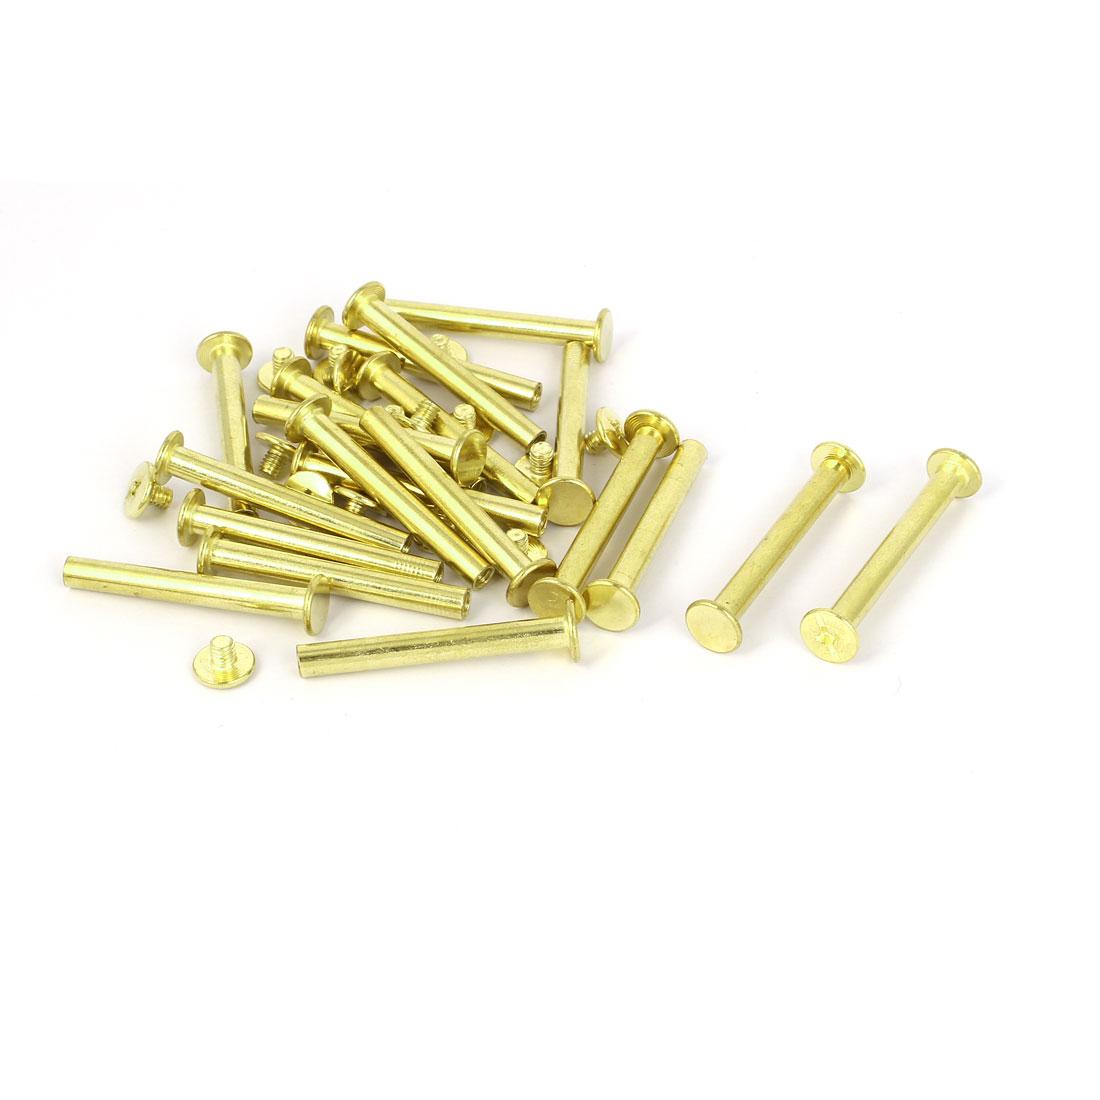 5mmx40mm Brass Plated Chicago Screws Binding Posts Docking Rivet 20pcs